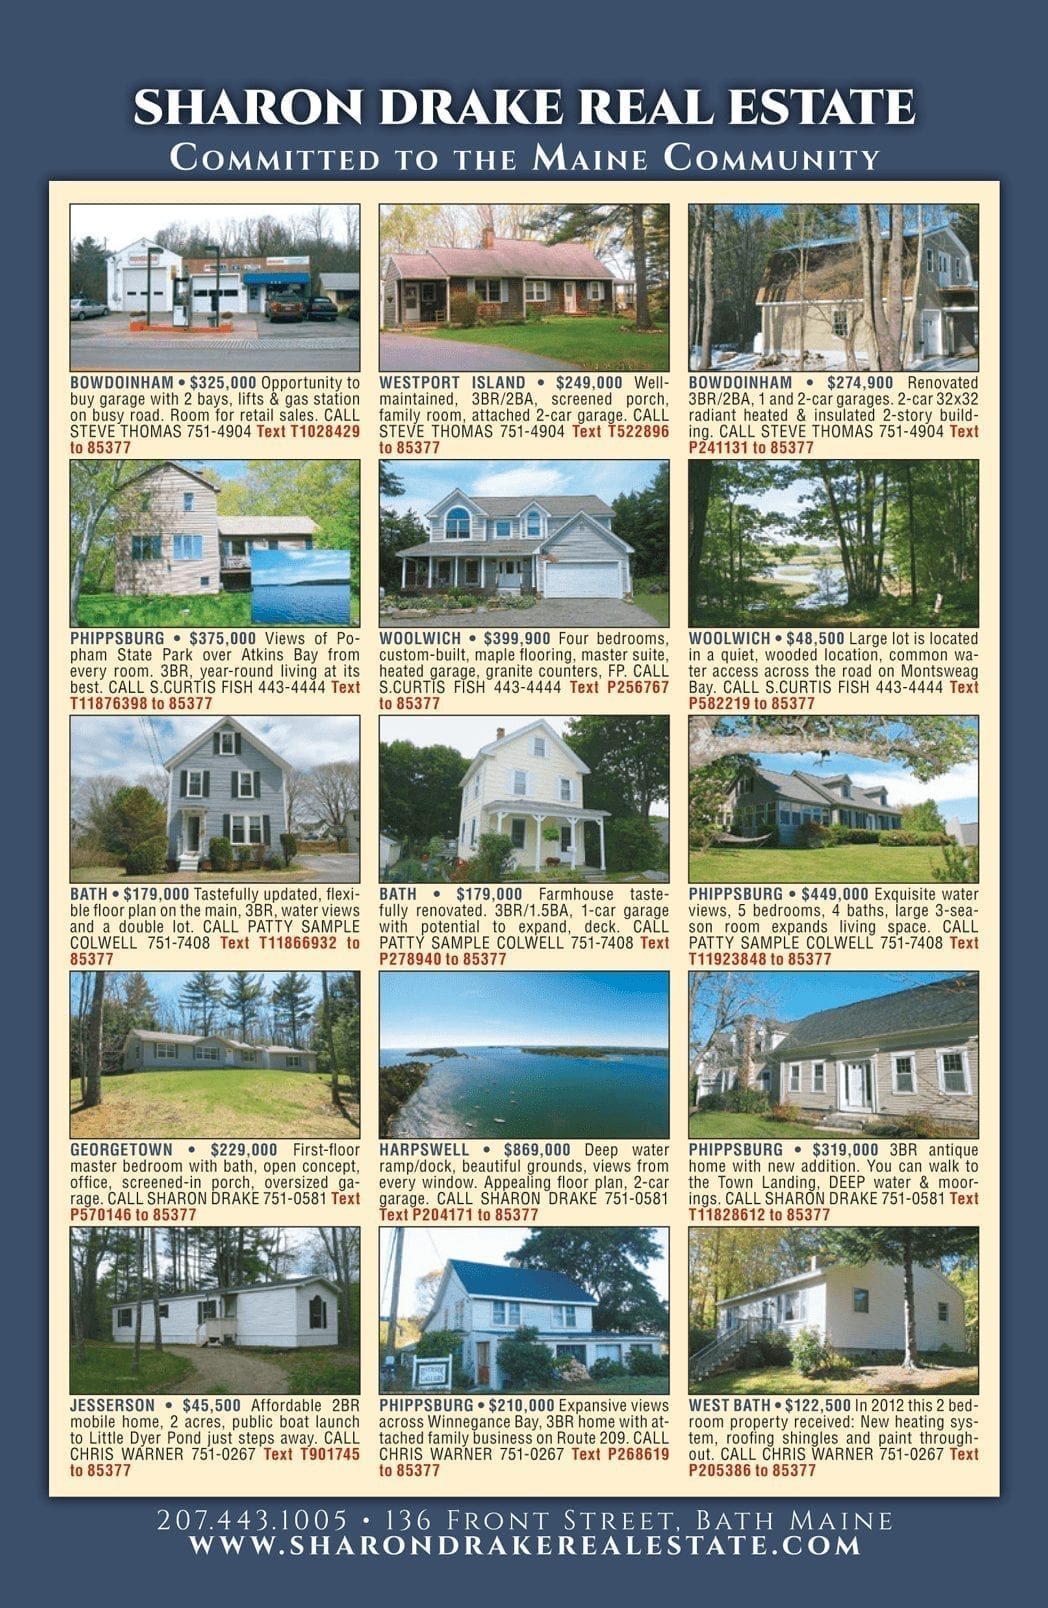 4-The-Real-Estate-Book-April-2015